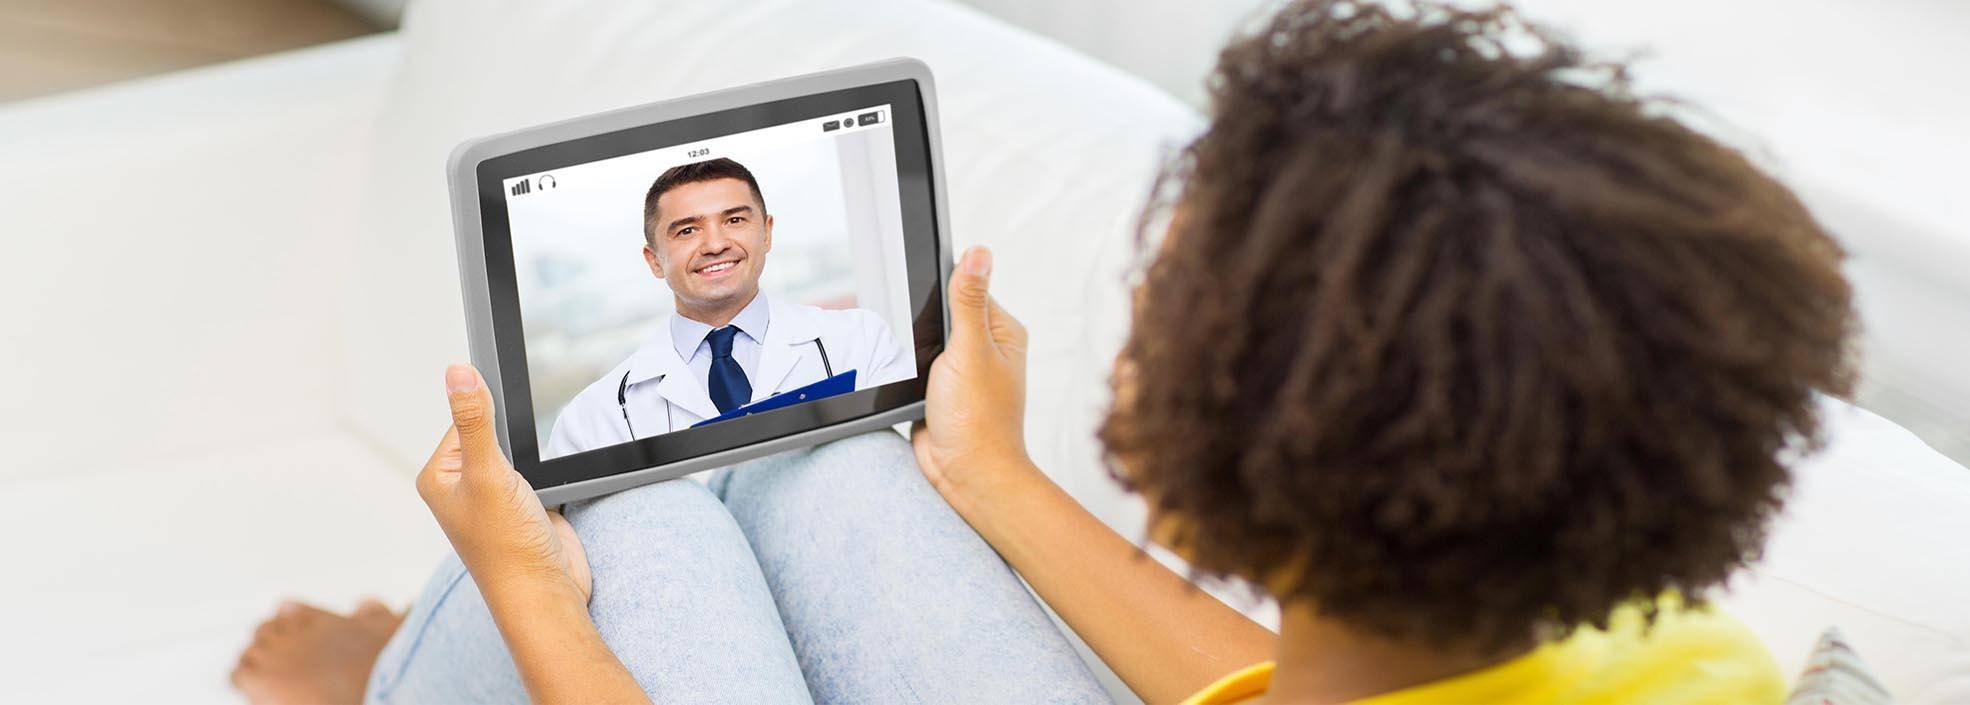 Podiatrist video appointmen